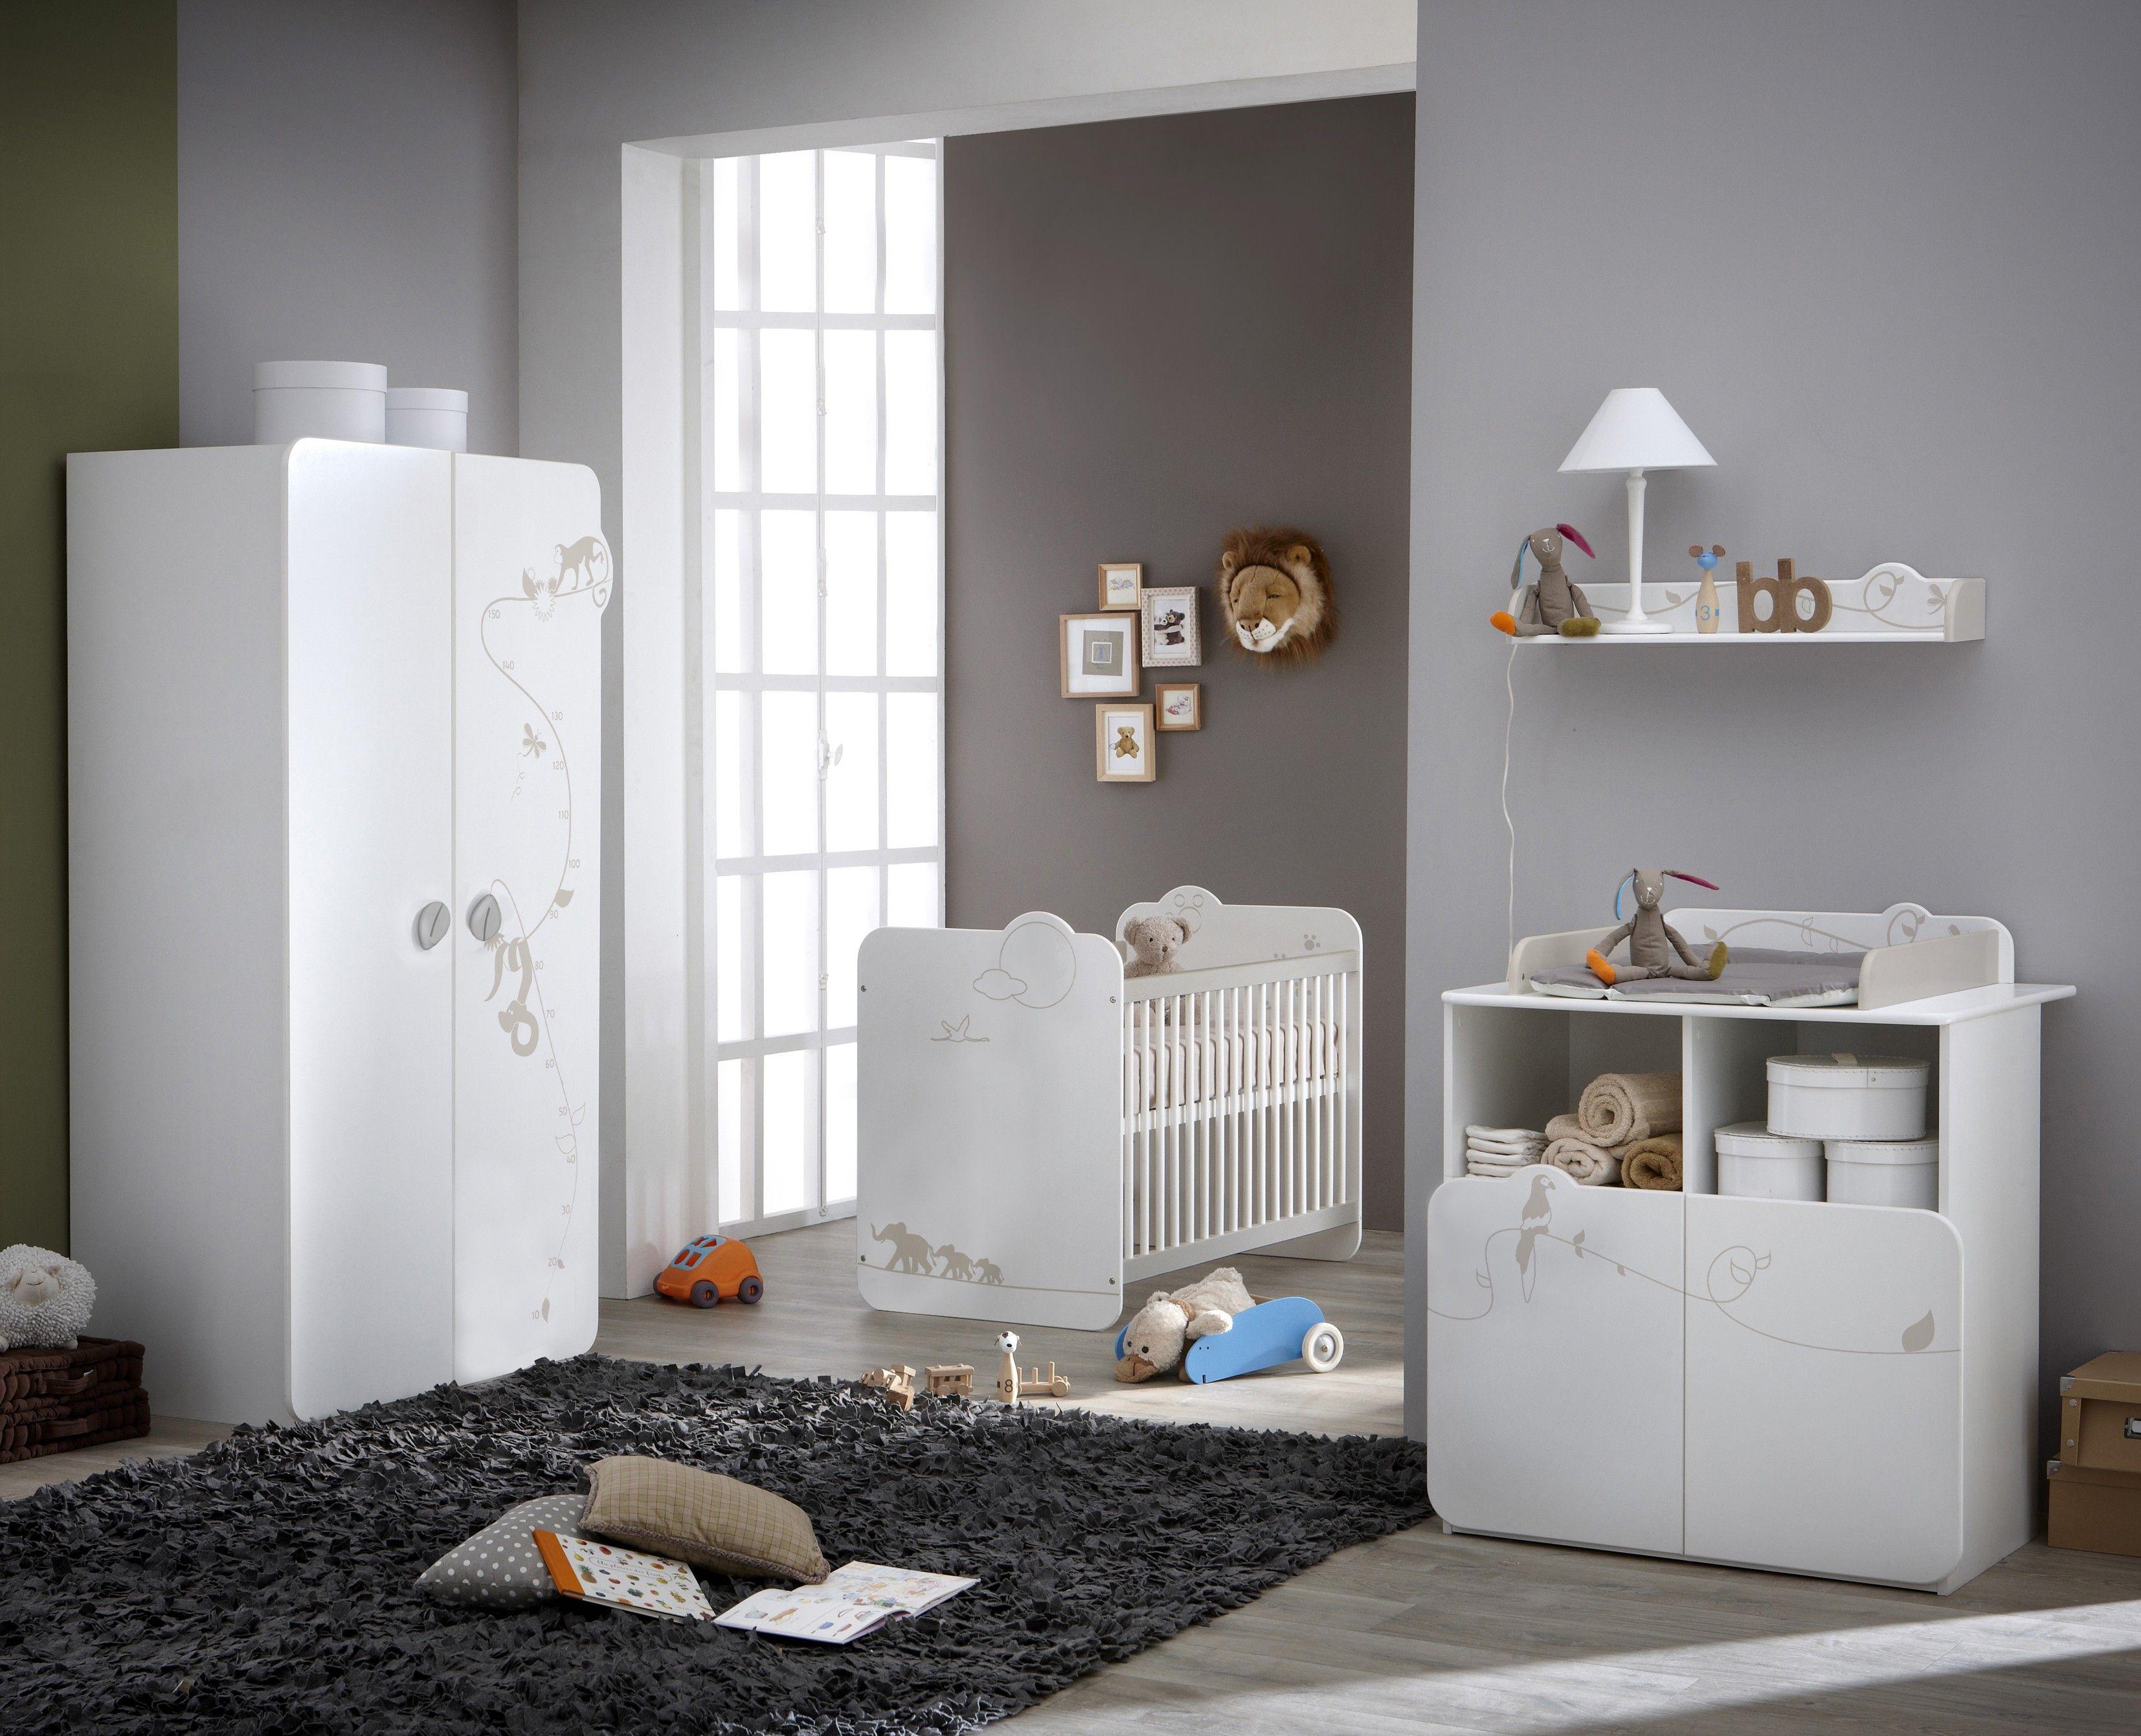 Chambre Bebe Complete Jungle Avec Images Deco Chambre Bebe